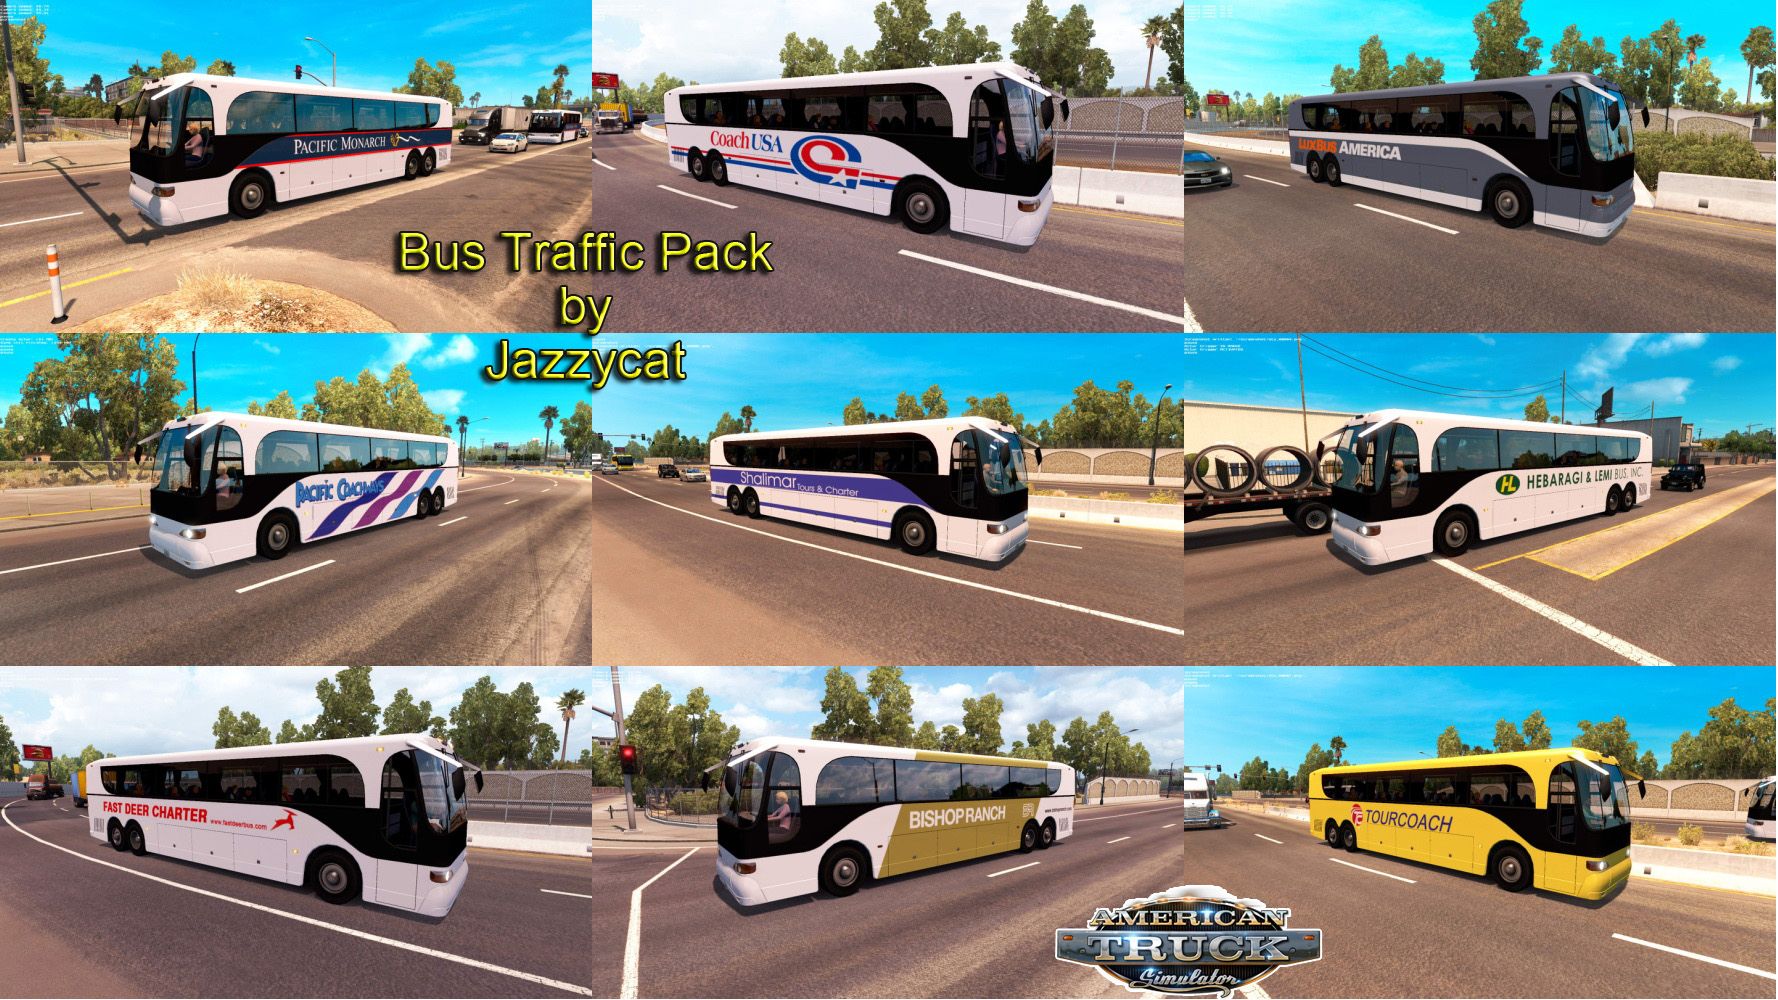 01_bus_traffic_pack_by_Jazzycat_v1.0.jpg